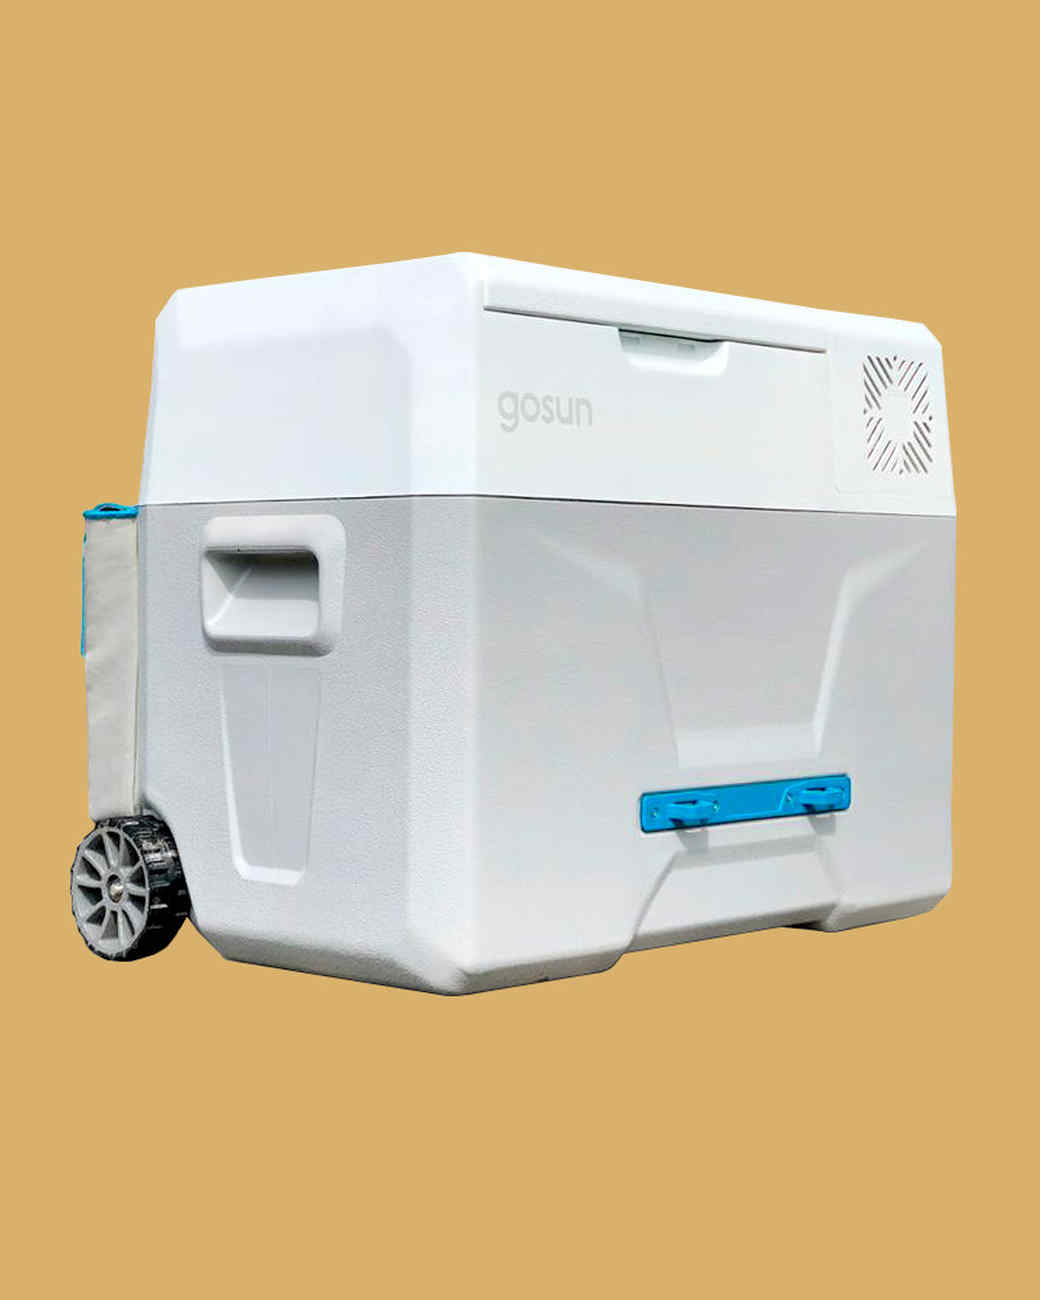 gosun solar-powered chill cooler